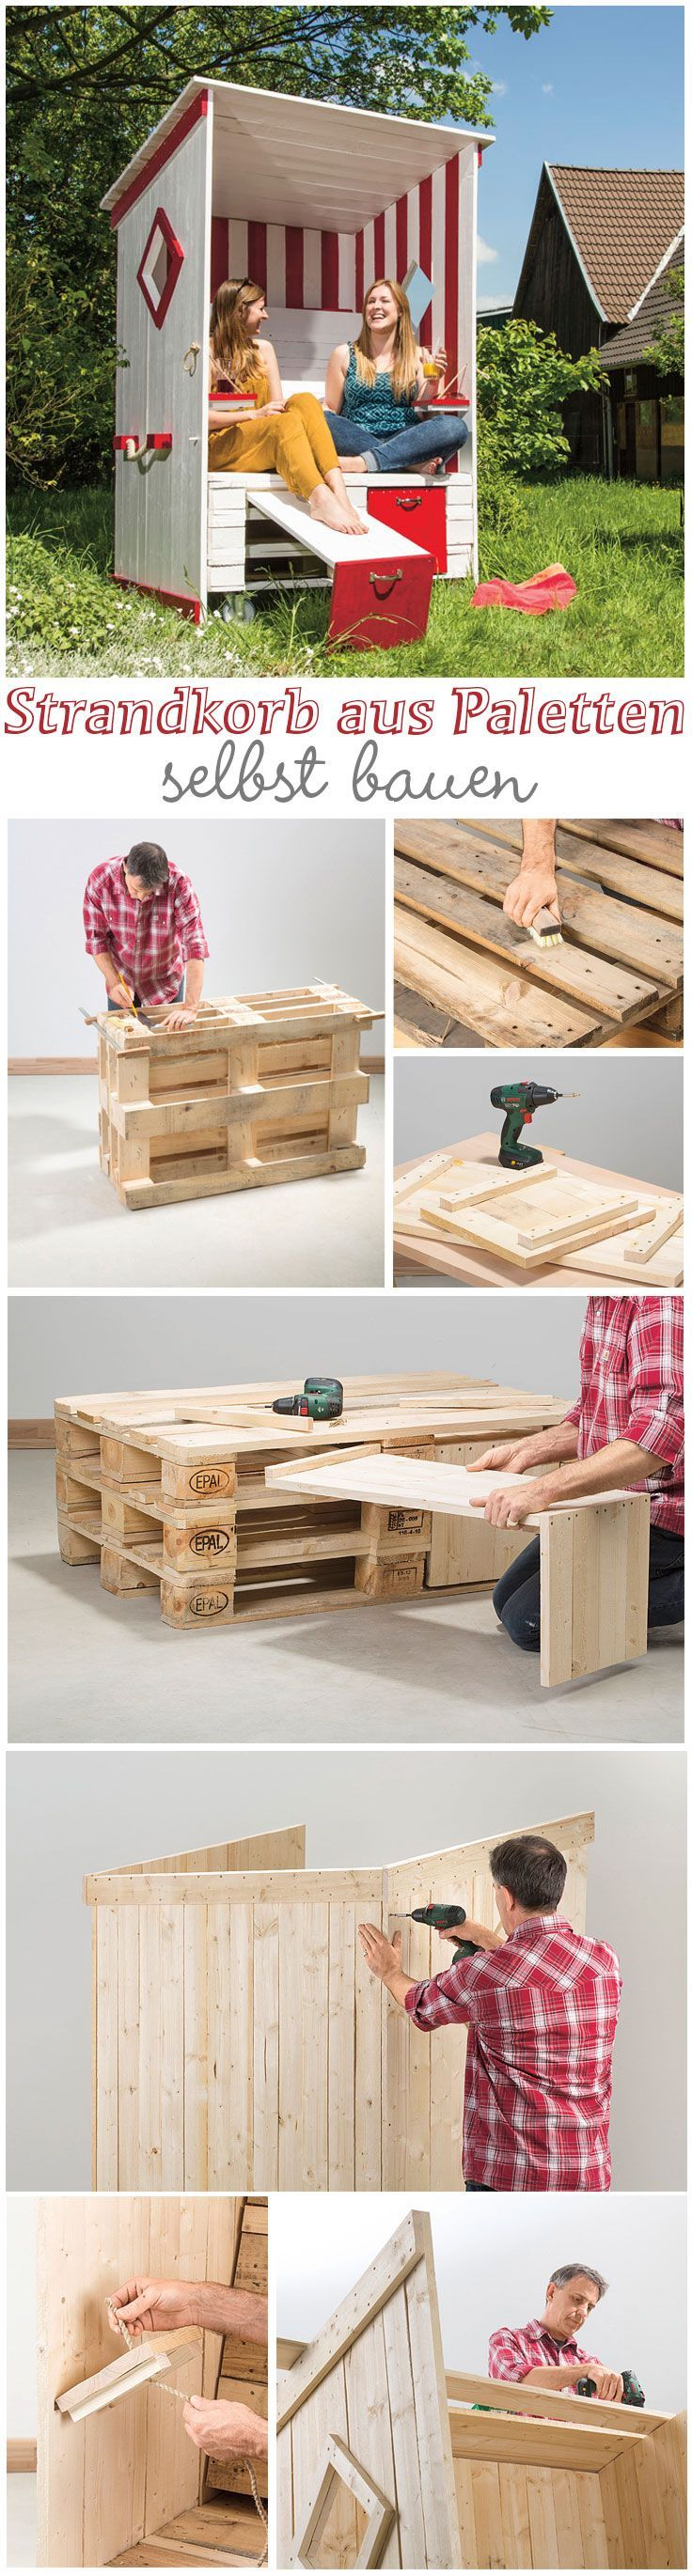 strandkorb aus paletten pinterest pallets gardens and pallet projects. Black Bedroom Furniture Sets. Home Design Ideas